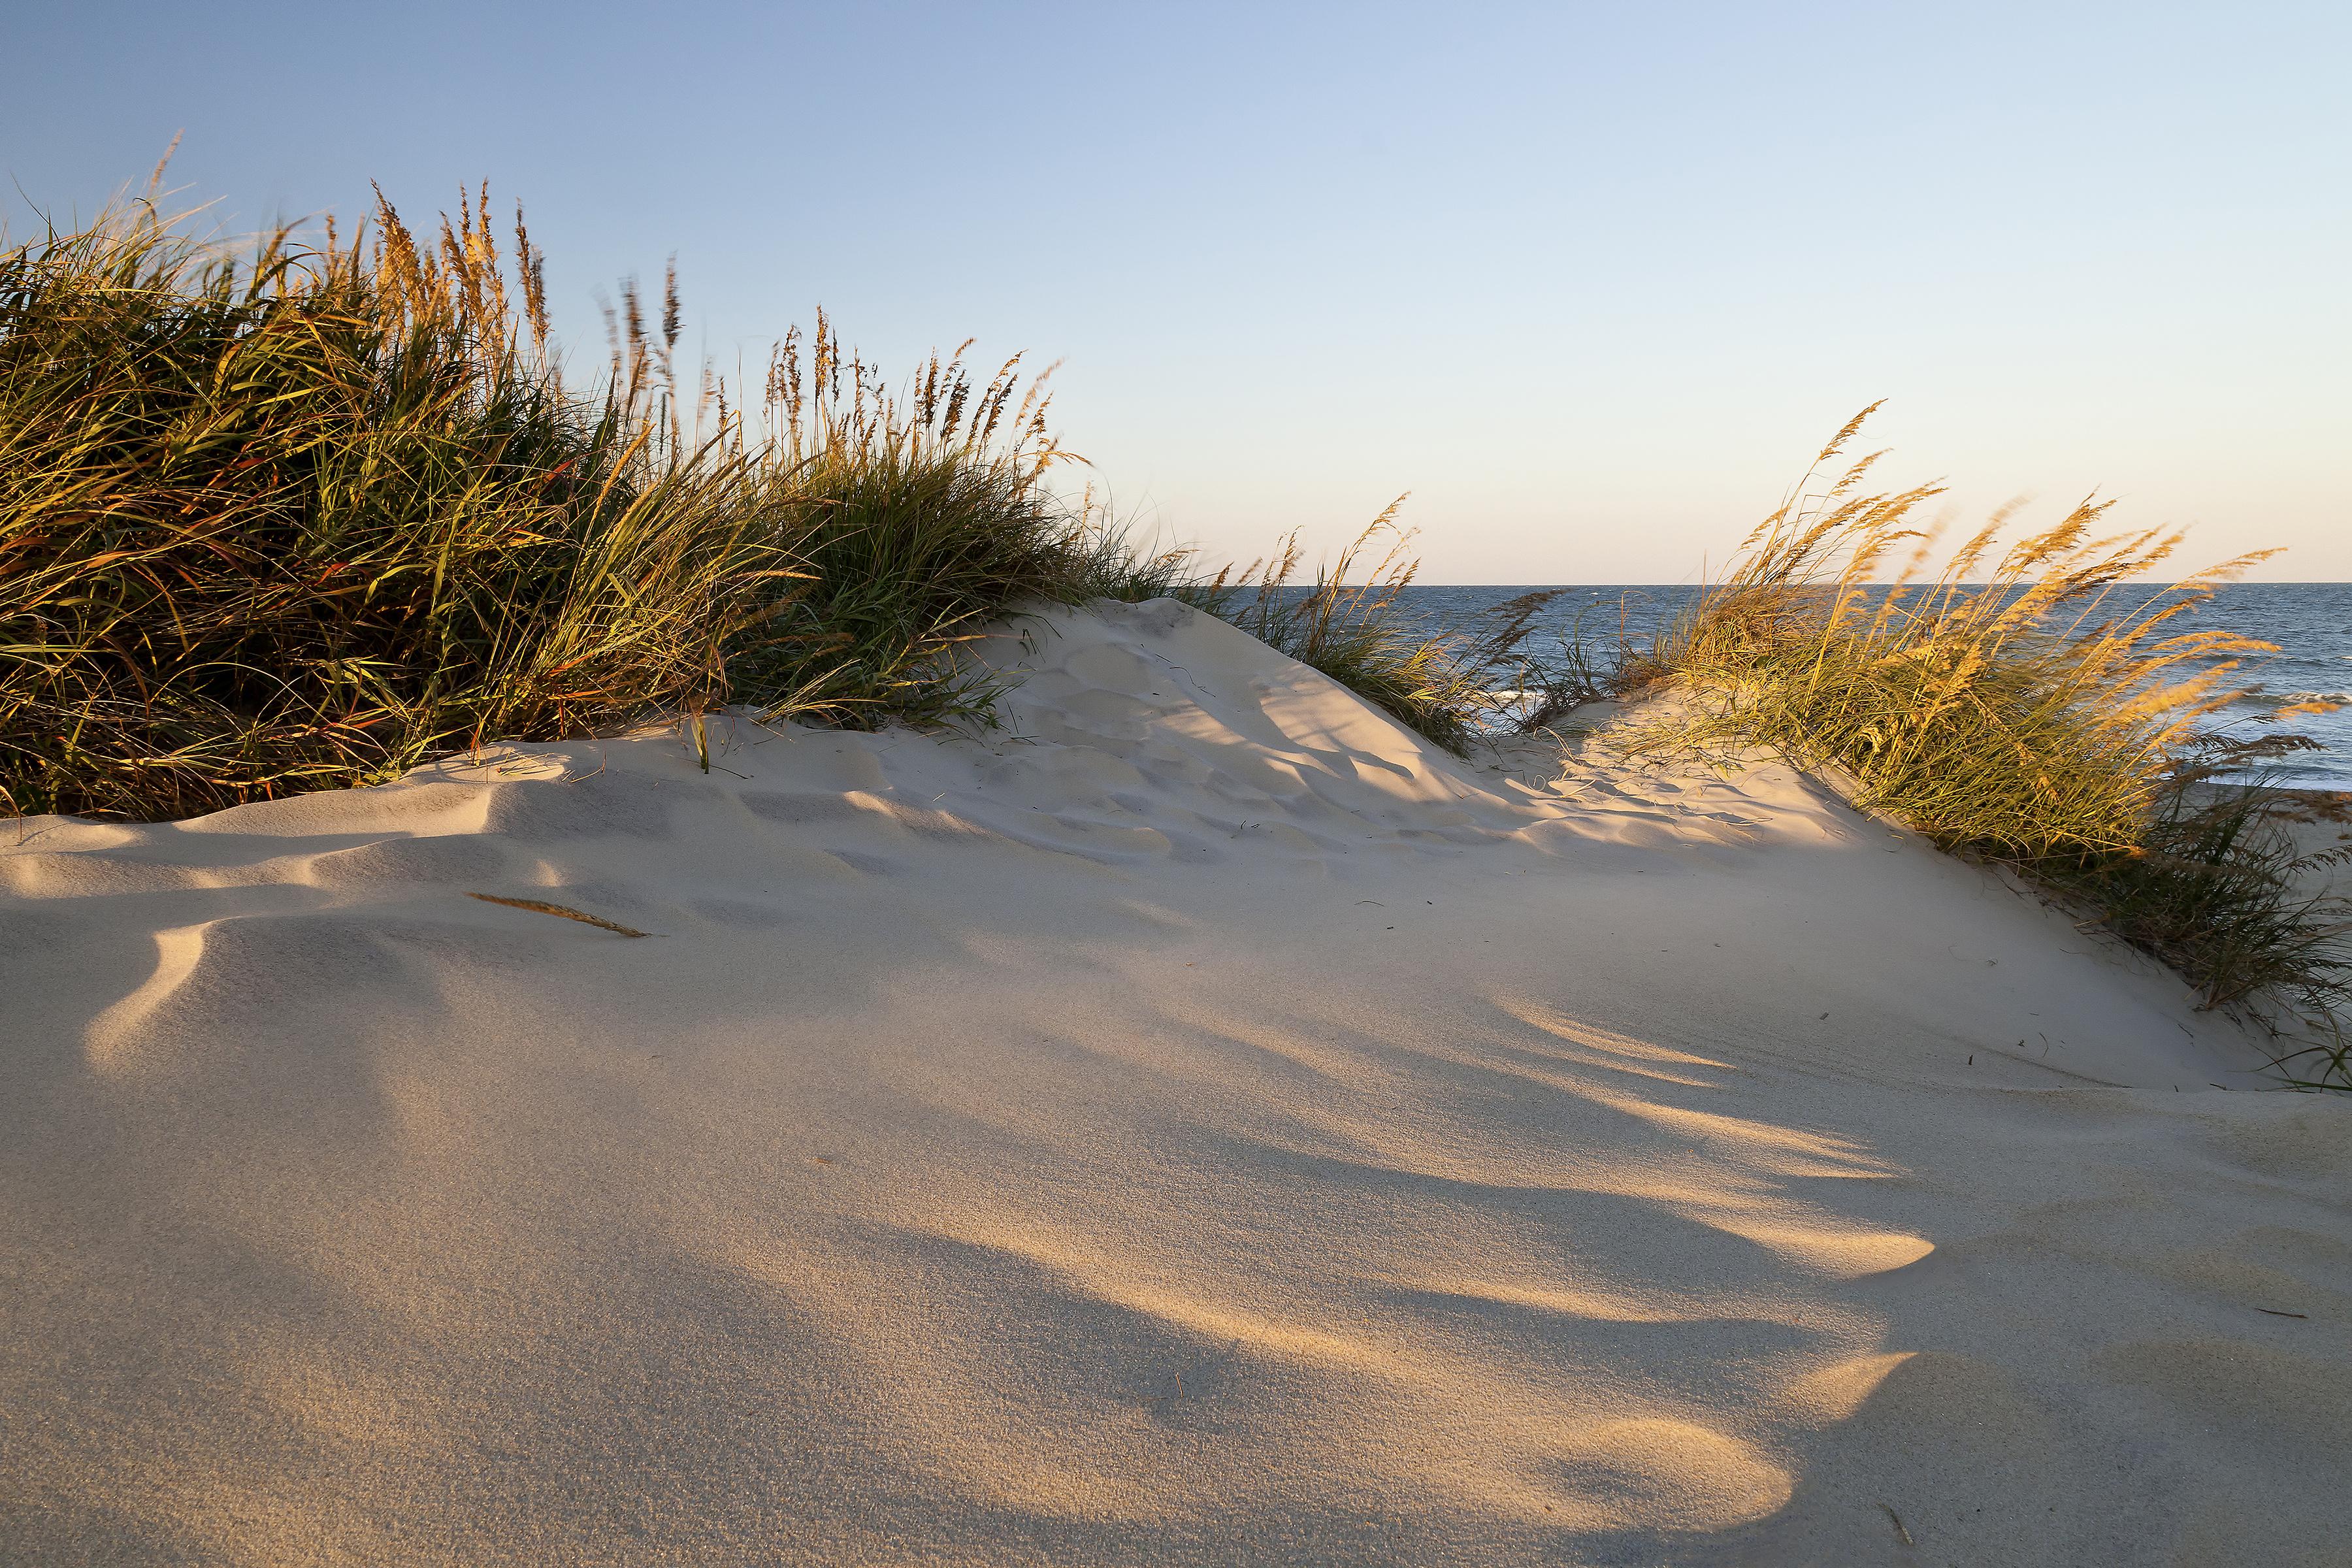 Pea Island NWR dunes Cape Hatteras